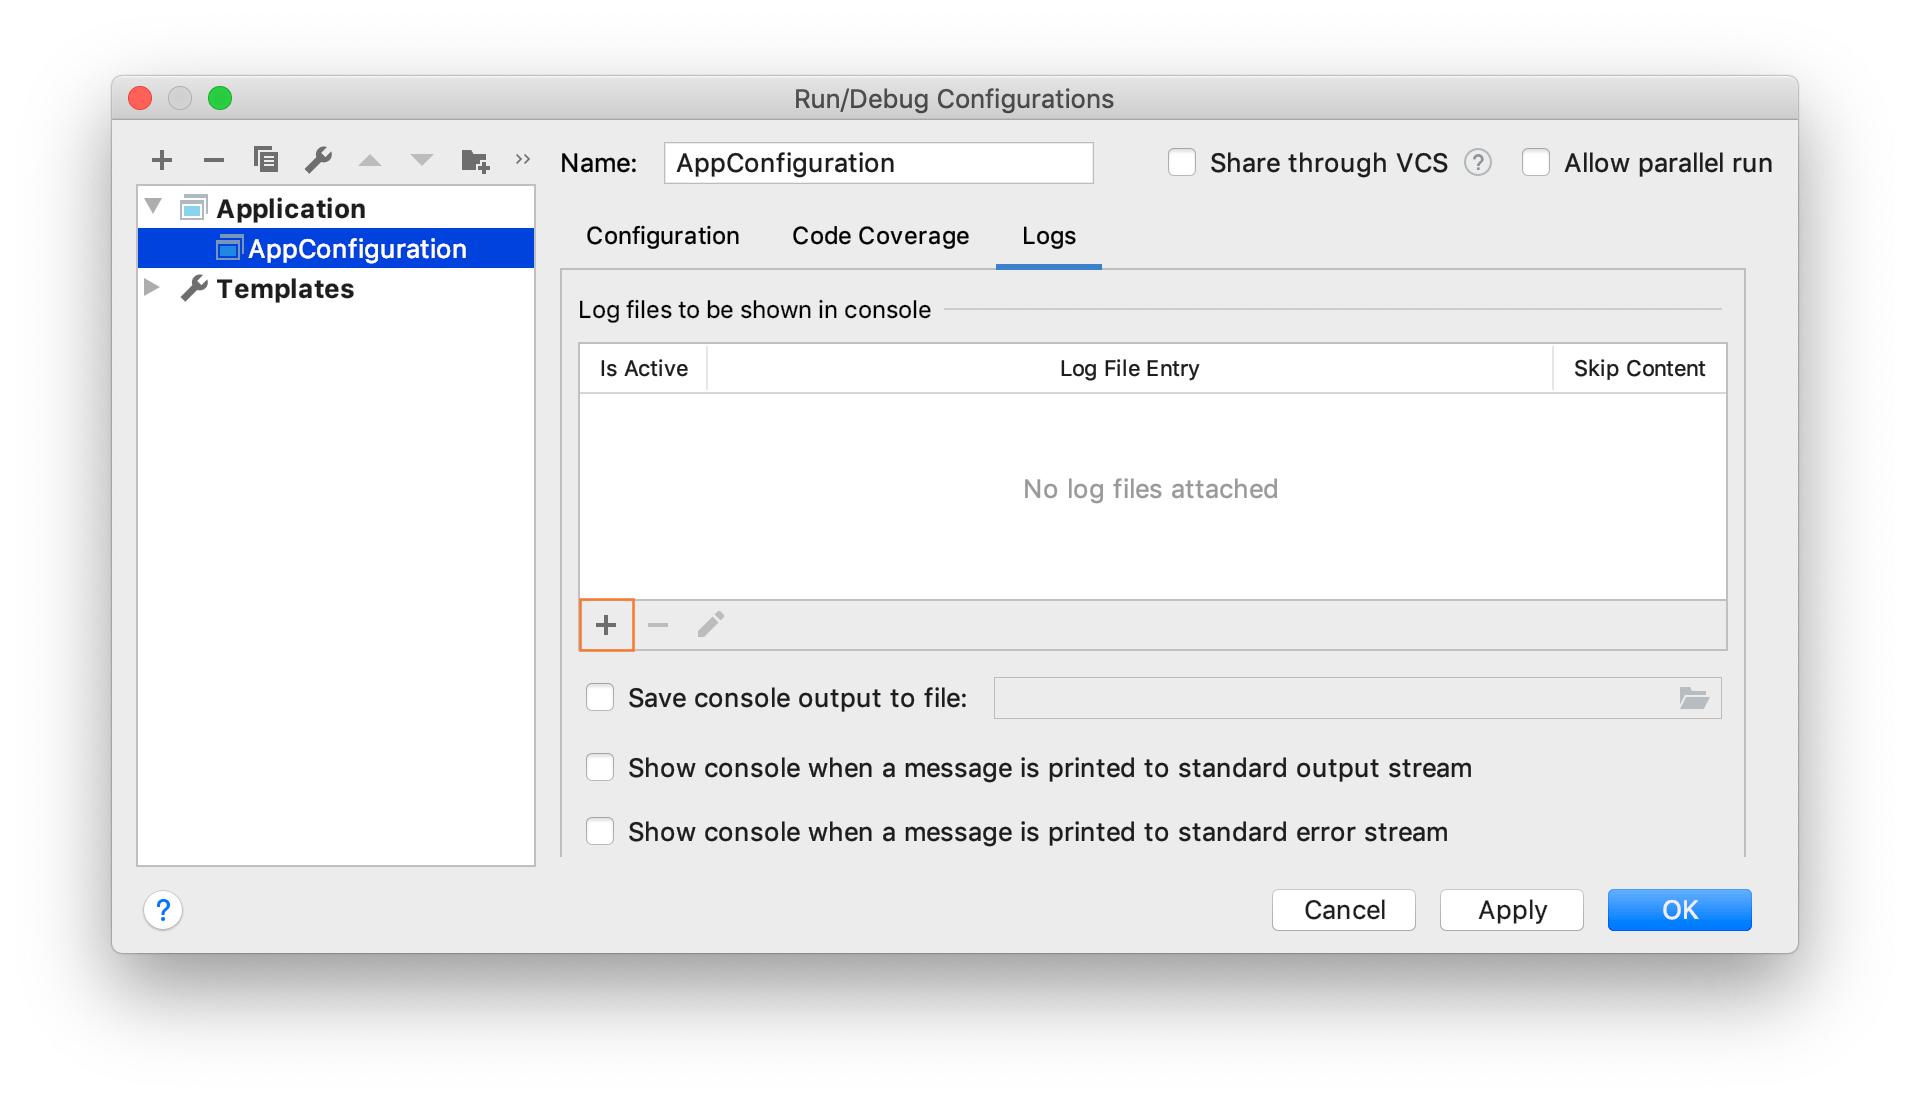 Opening the Edit Log Files dialog